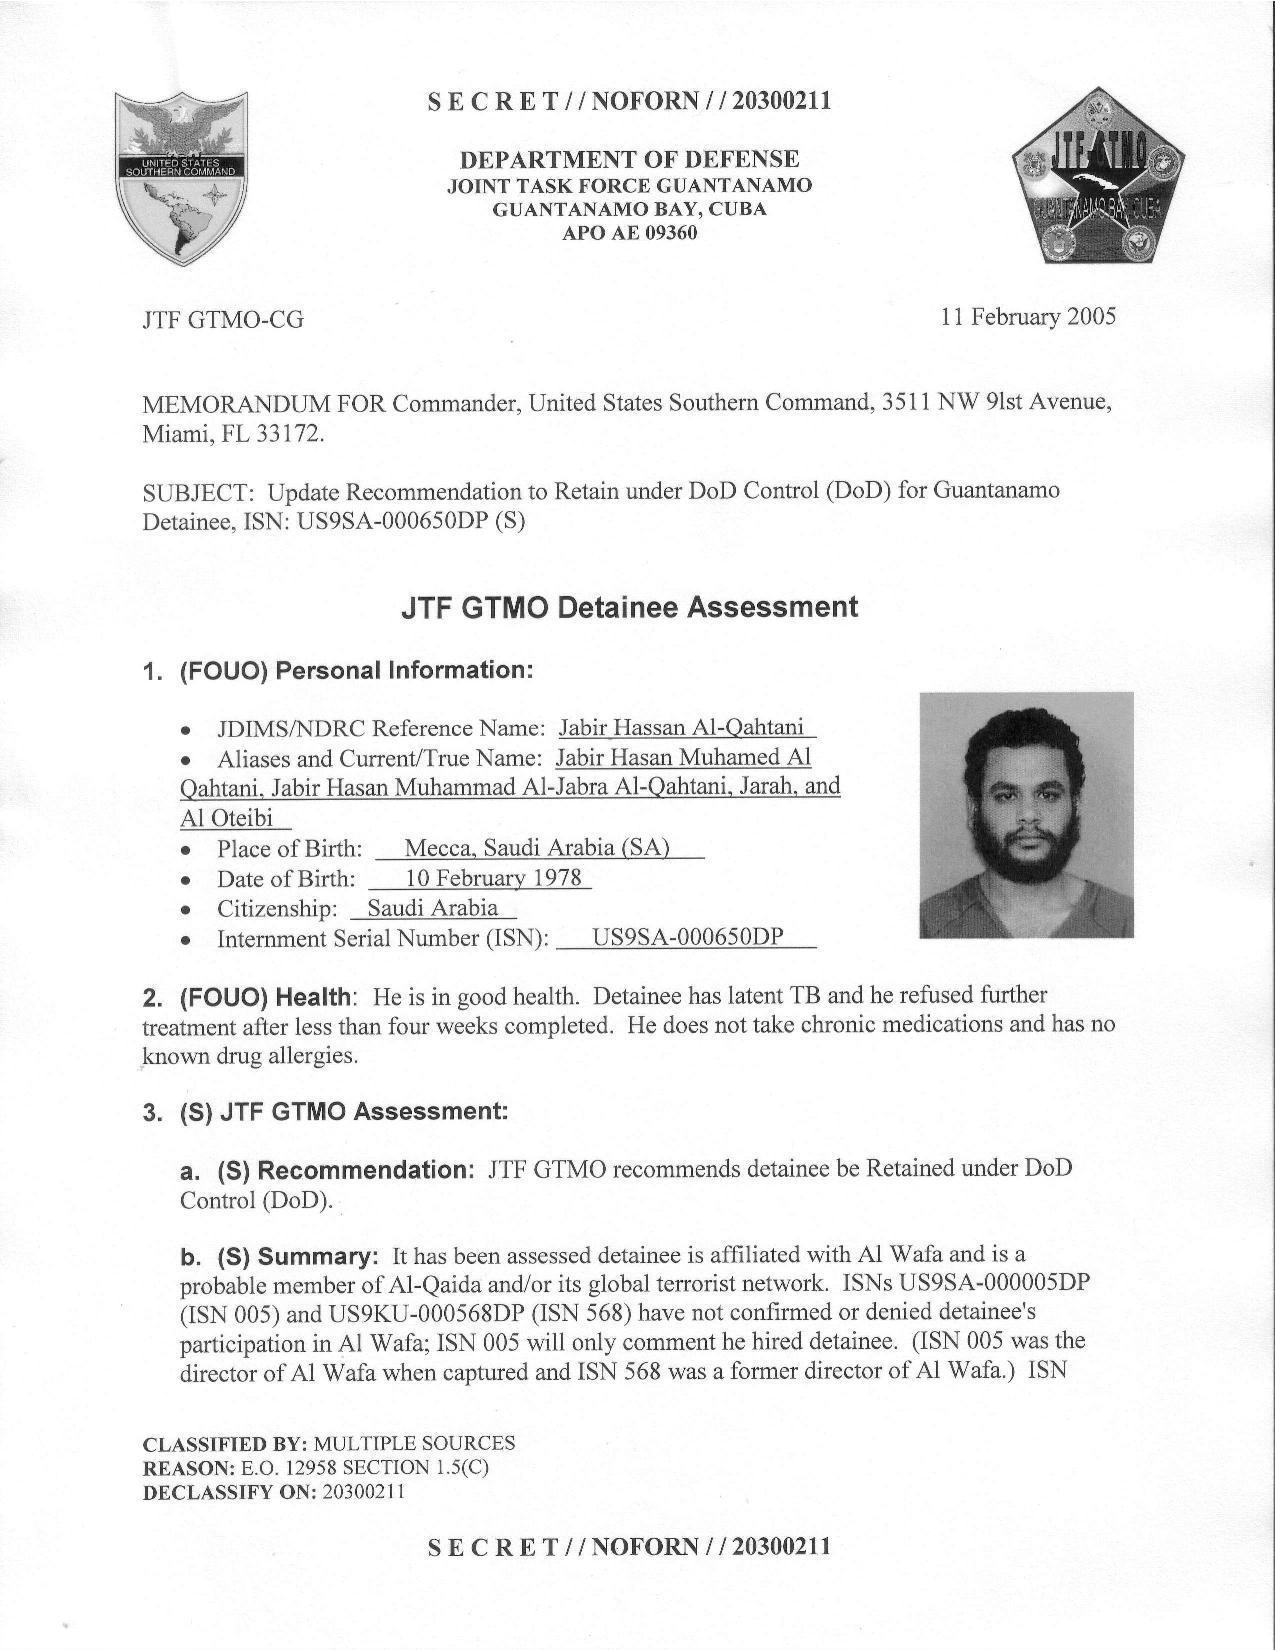 ISN 00650, Jabir Hasan Muhamed Al Qahtani's Guantanamo detainee assessment.pdf